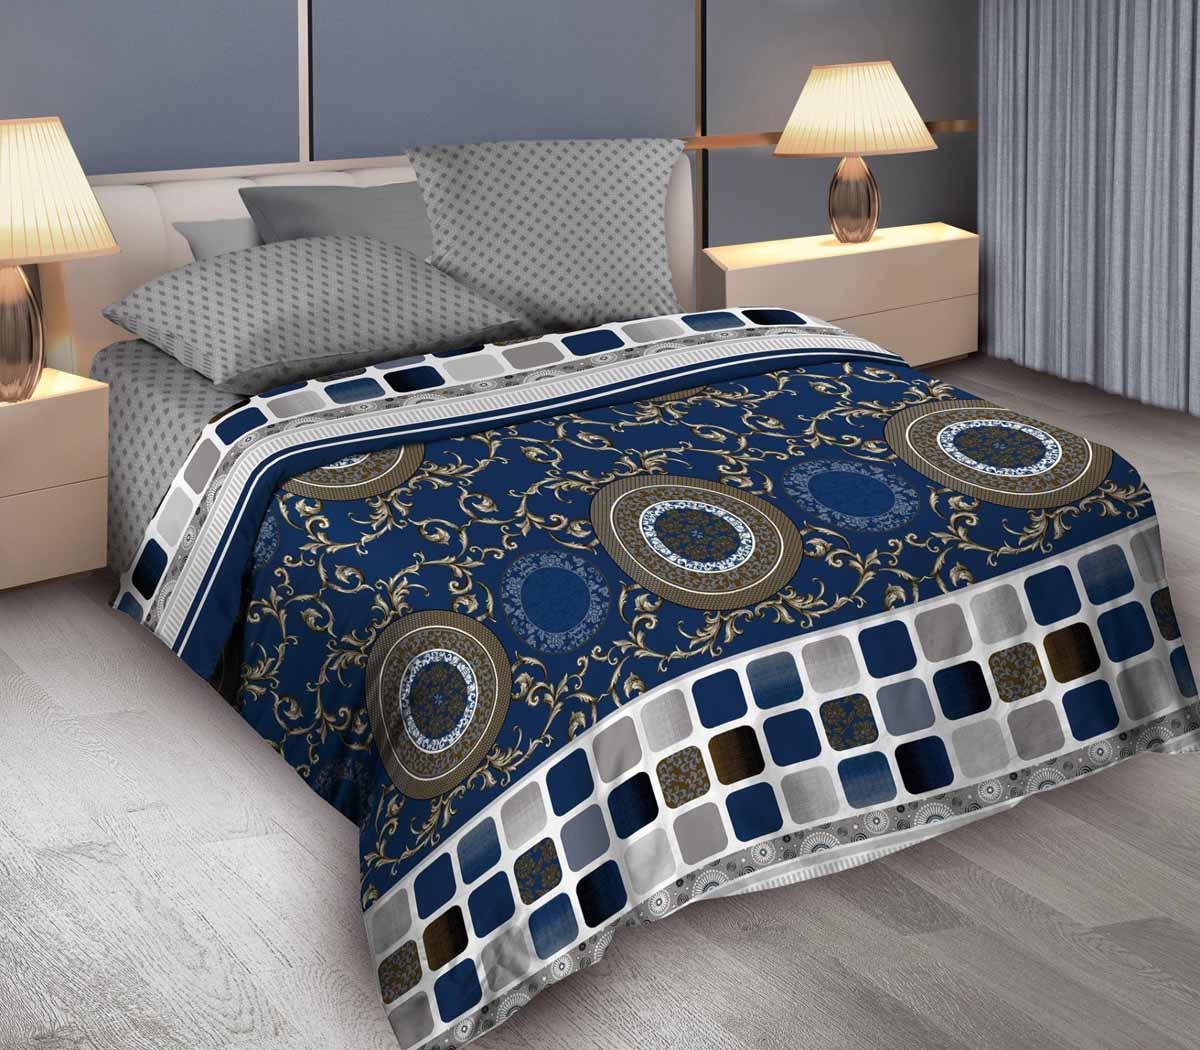 Комплект белья Wenge Bruno, евро, наволочки 70x70, цвет: синий